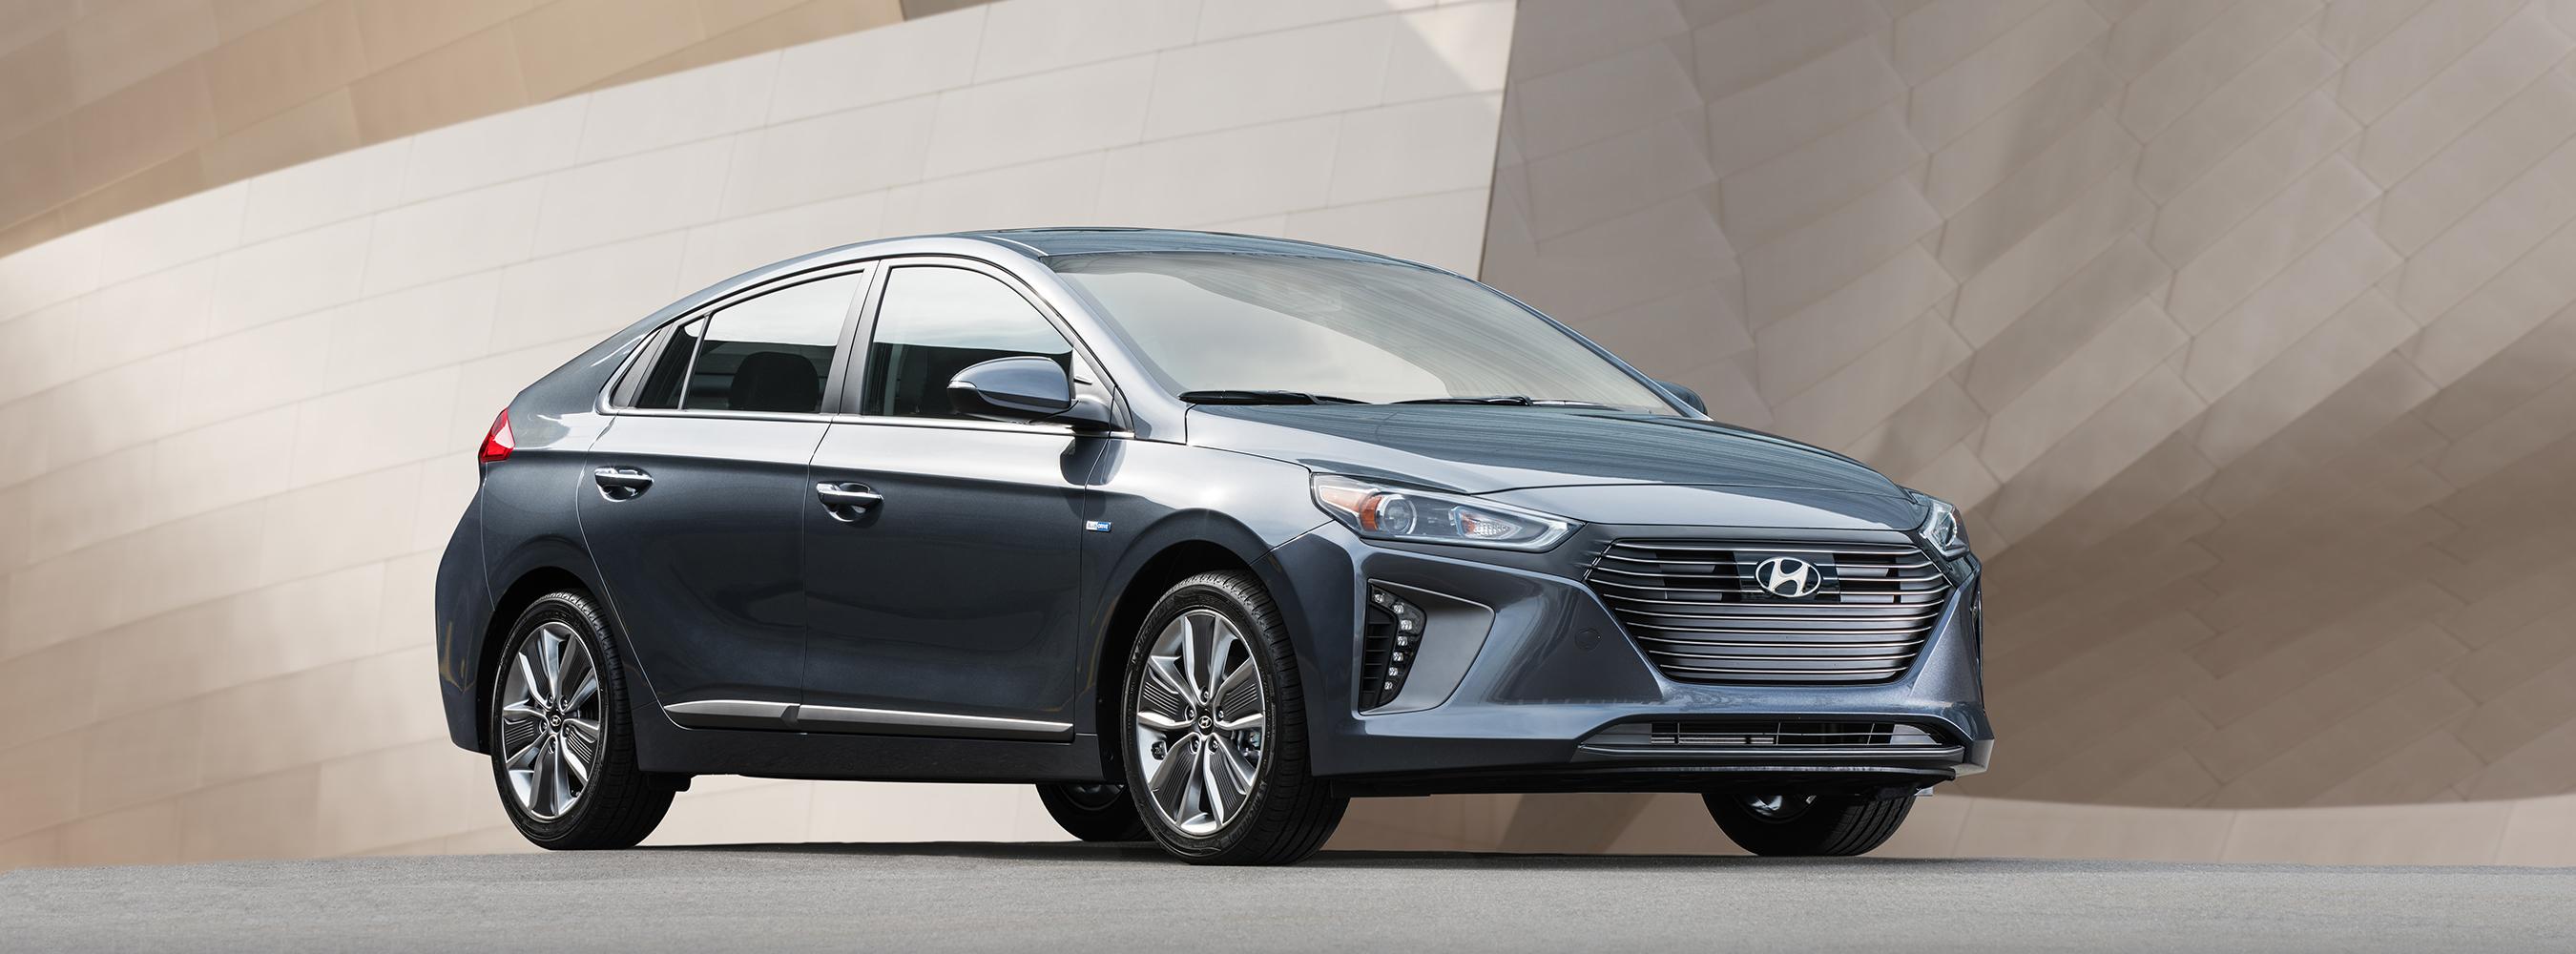 2017 Hyundai Ioniq Model Lineup Makes U S Debut At New York International Auto Show